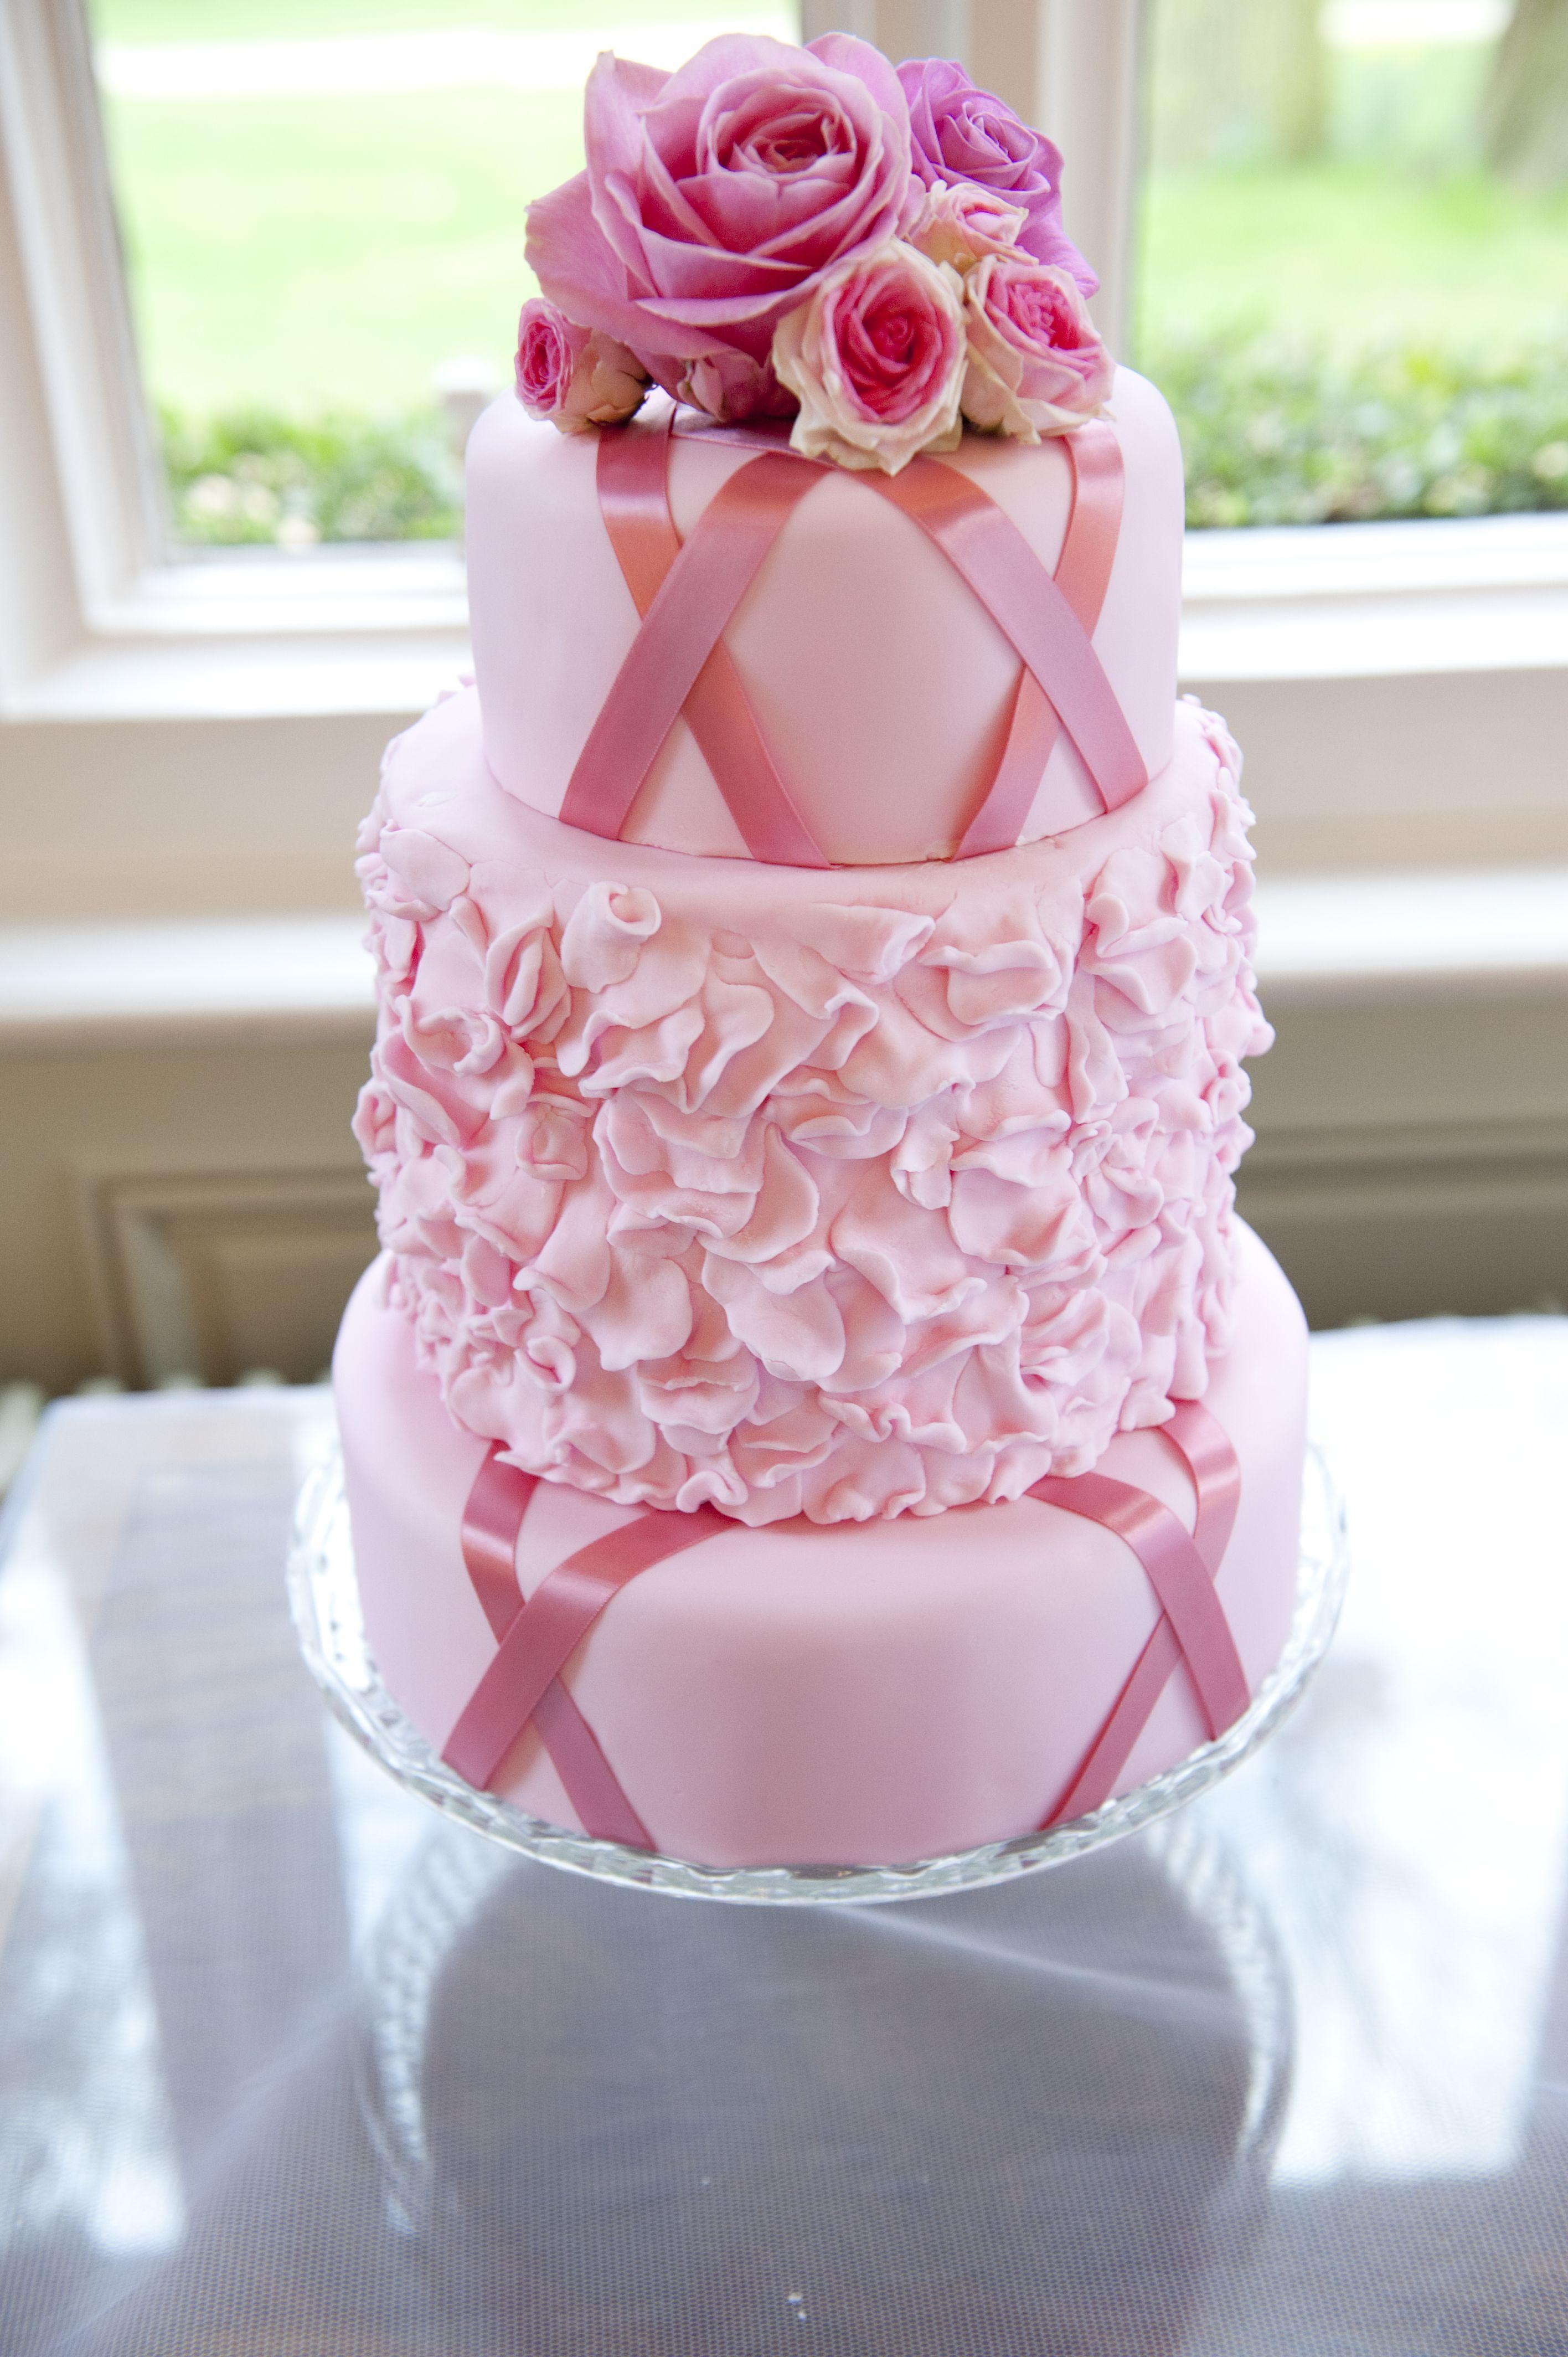 Indian Weddings Inspirations. Pink Wedding Cake. Repinned